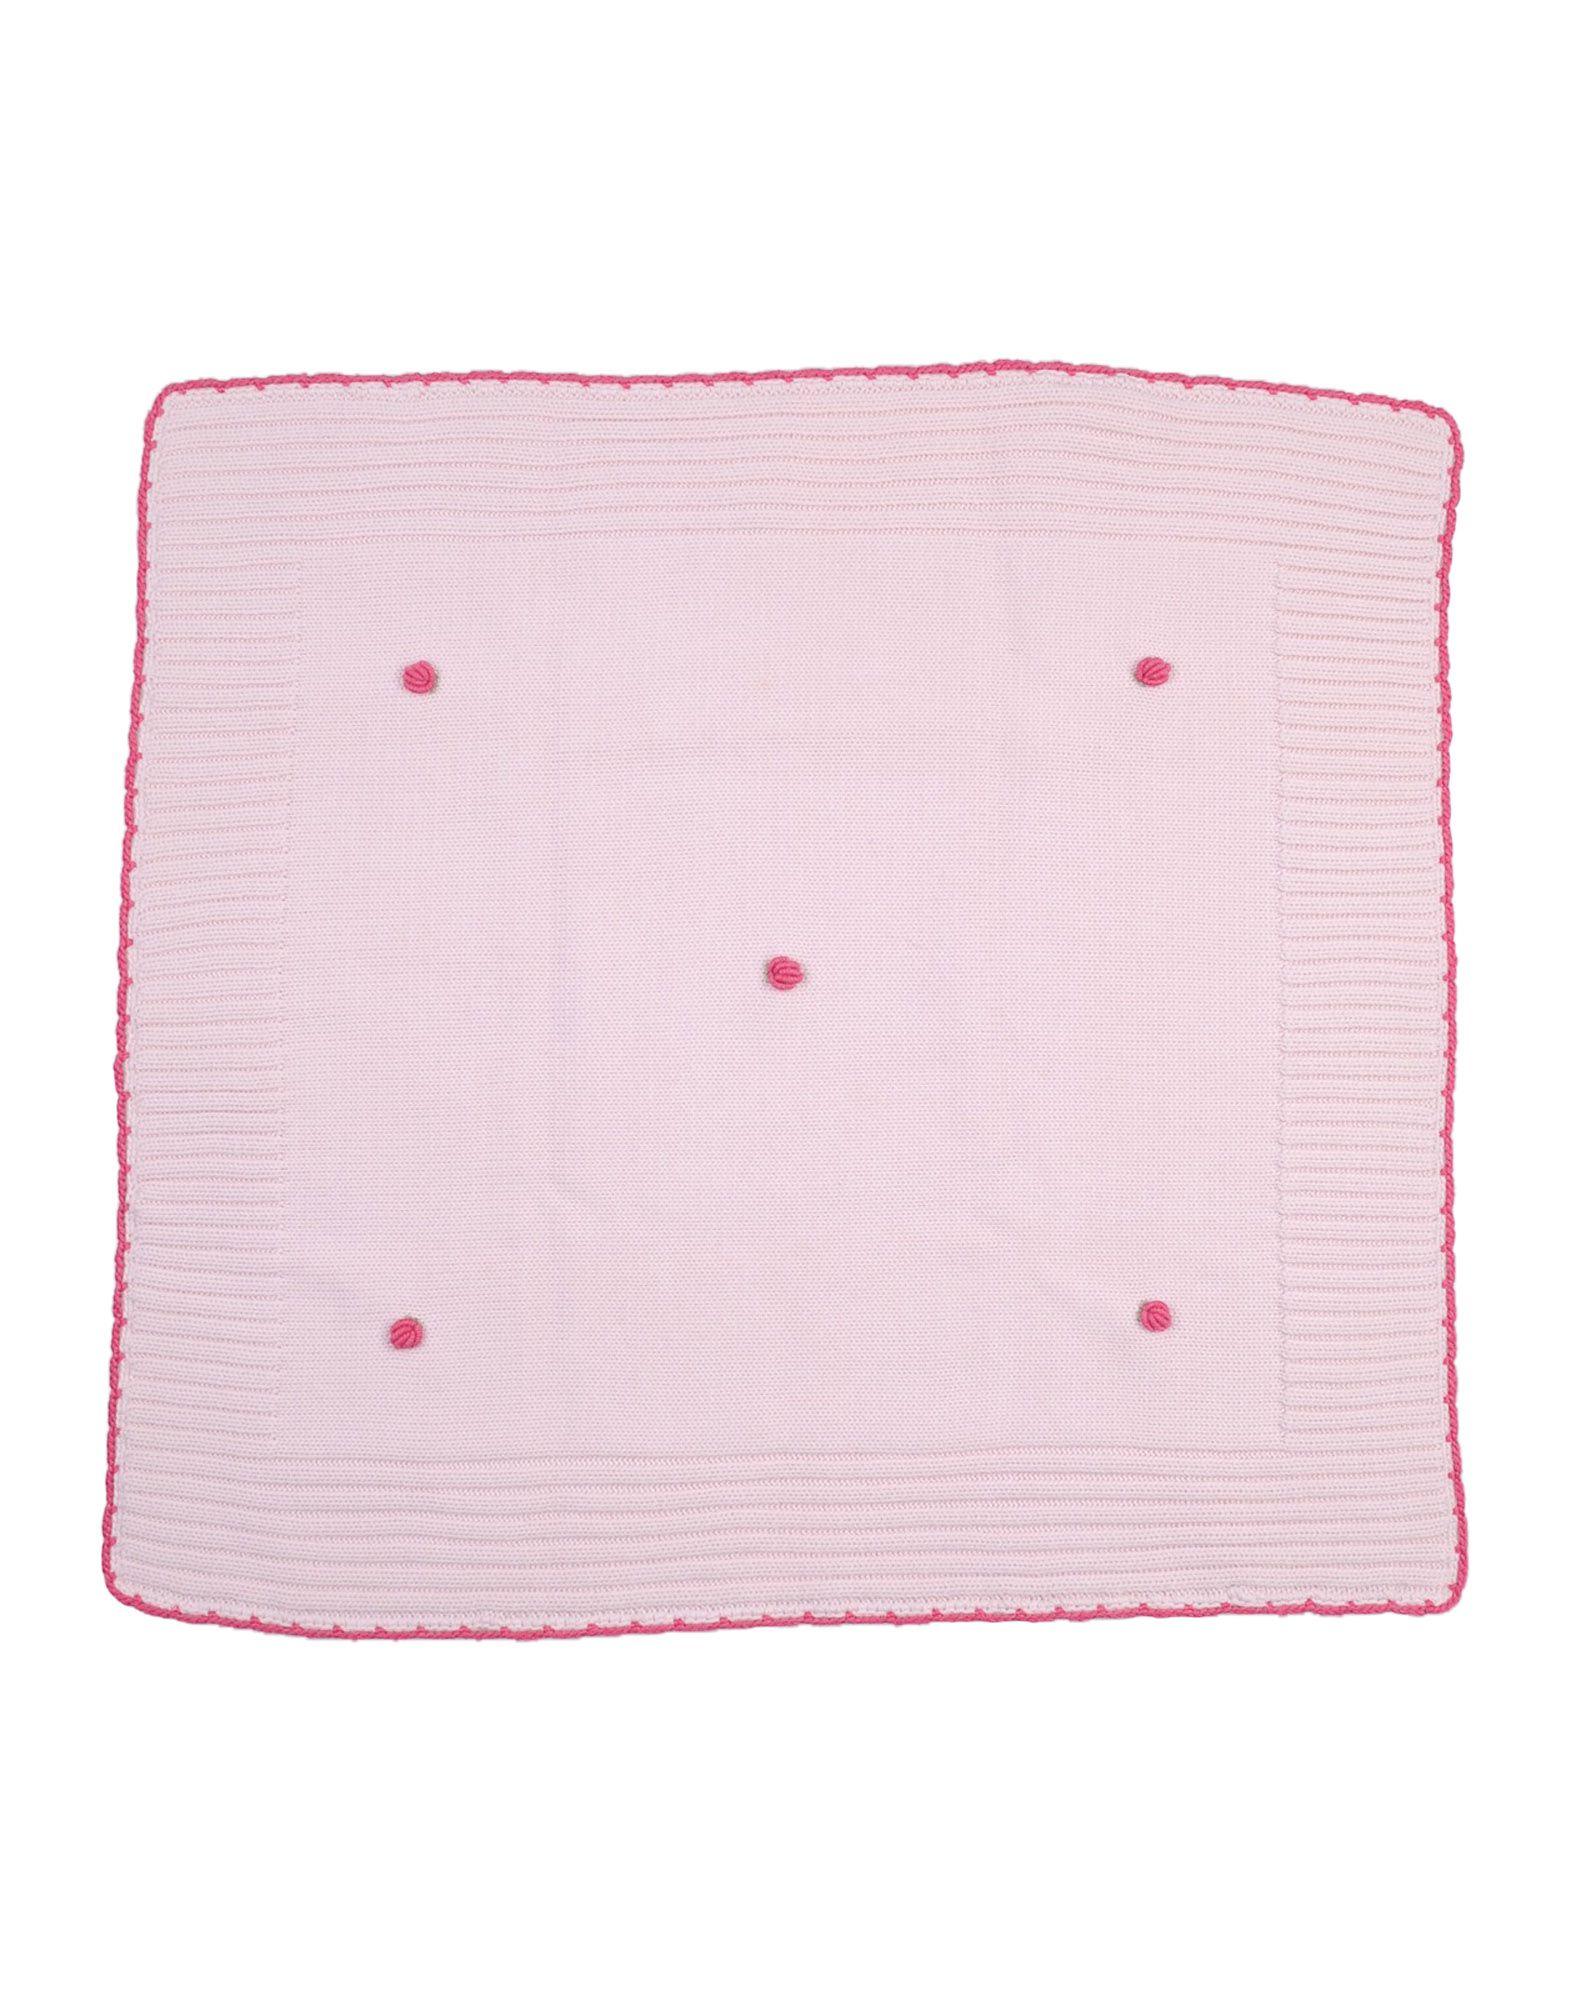 LITTLE BEAR Одеяльце для младенцев mori одеяльце для младенцев